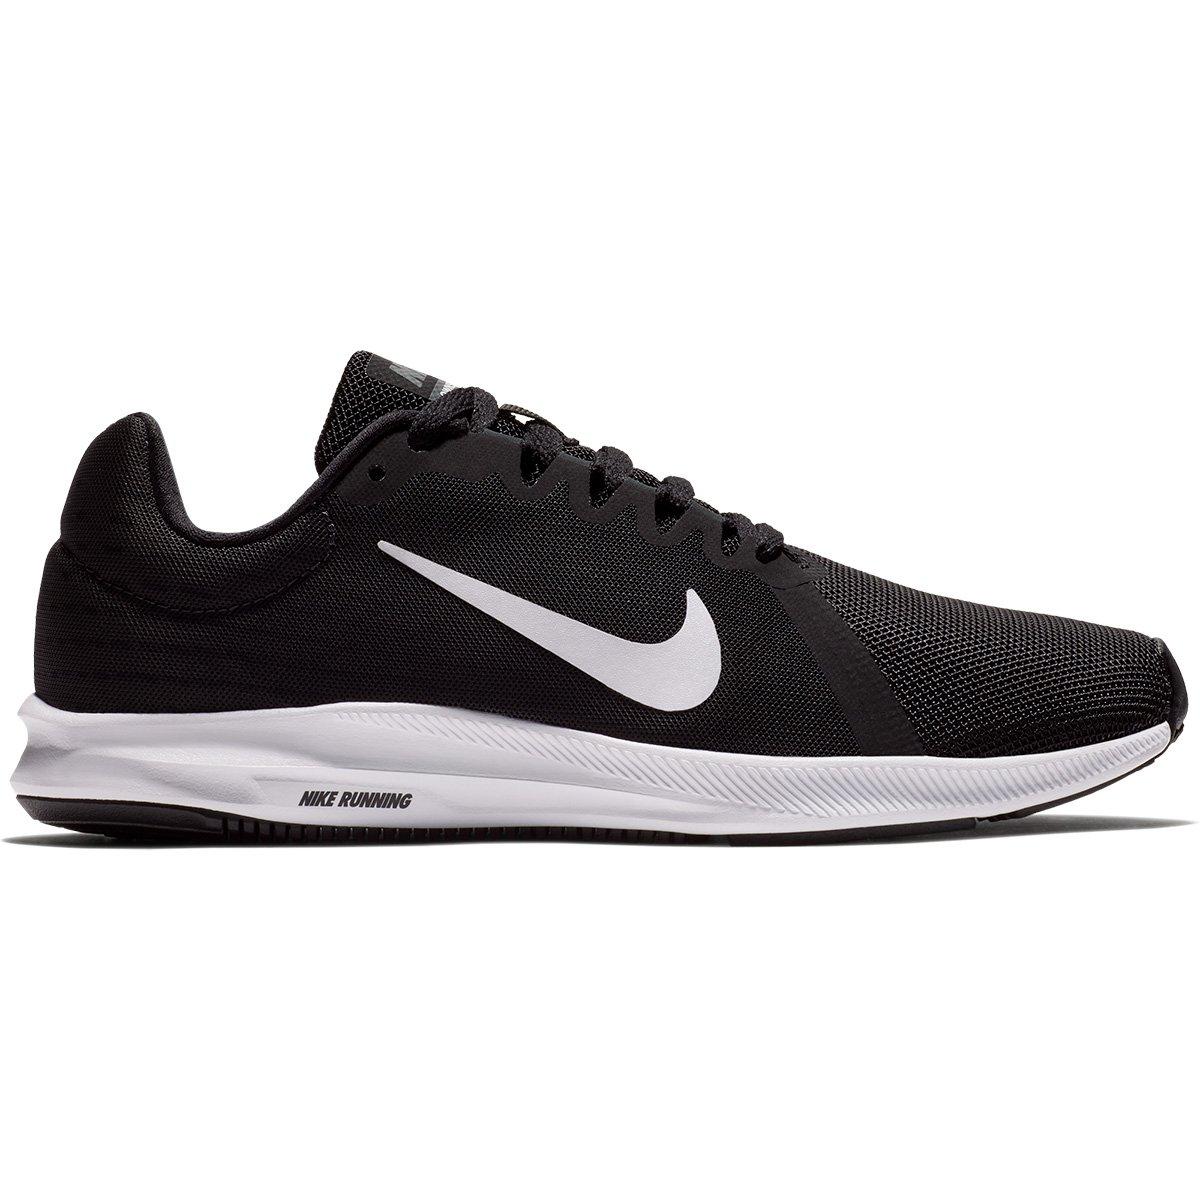 Tênis Nike Wmns Downshifter 8 Feminino - Preto e Branco - Compre ... edd567f7b8274